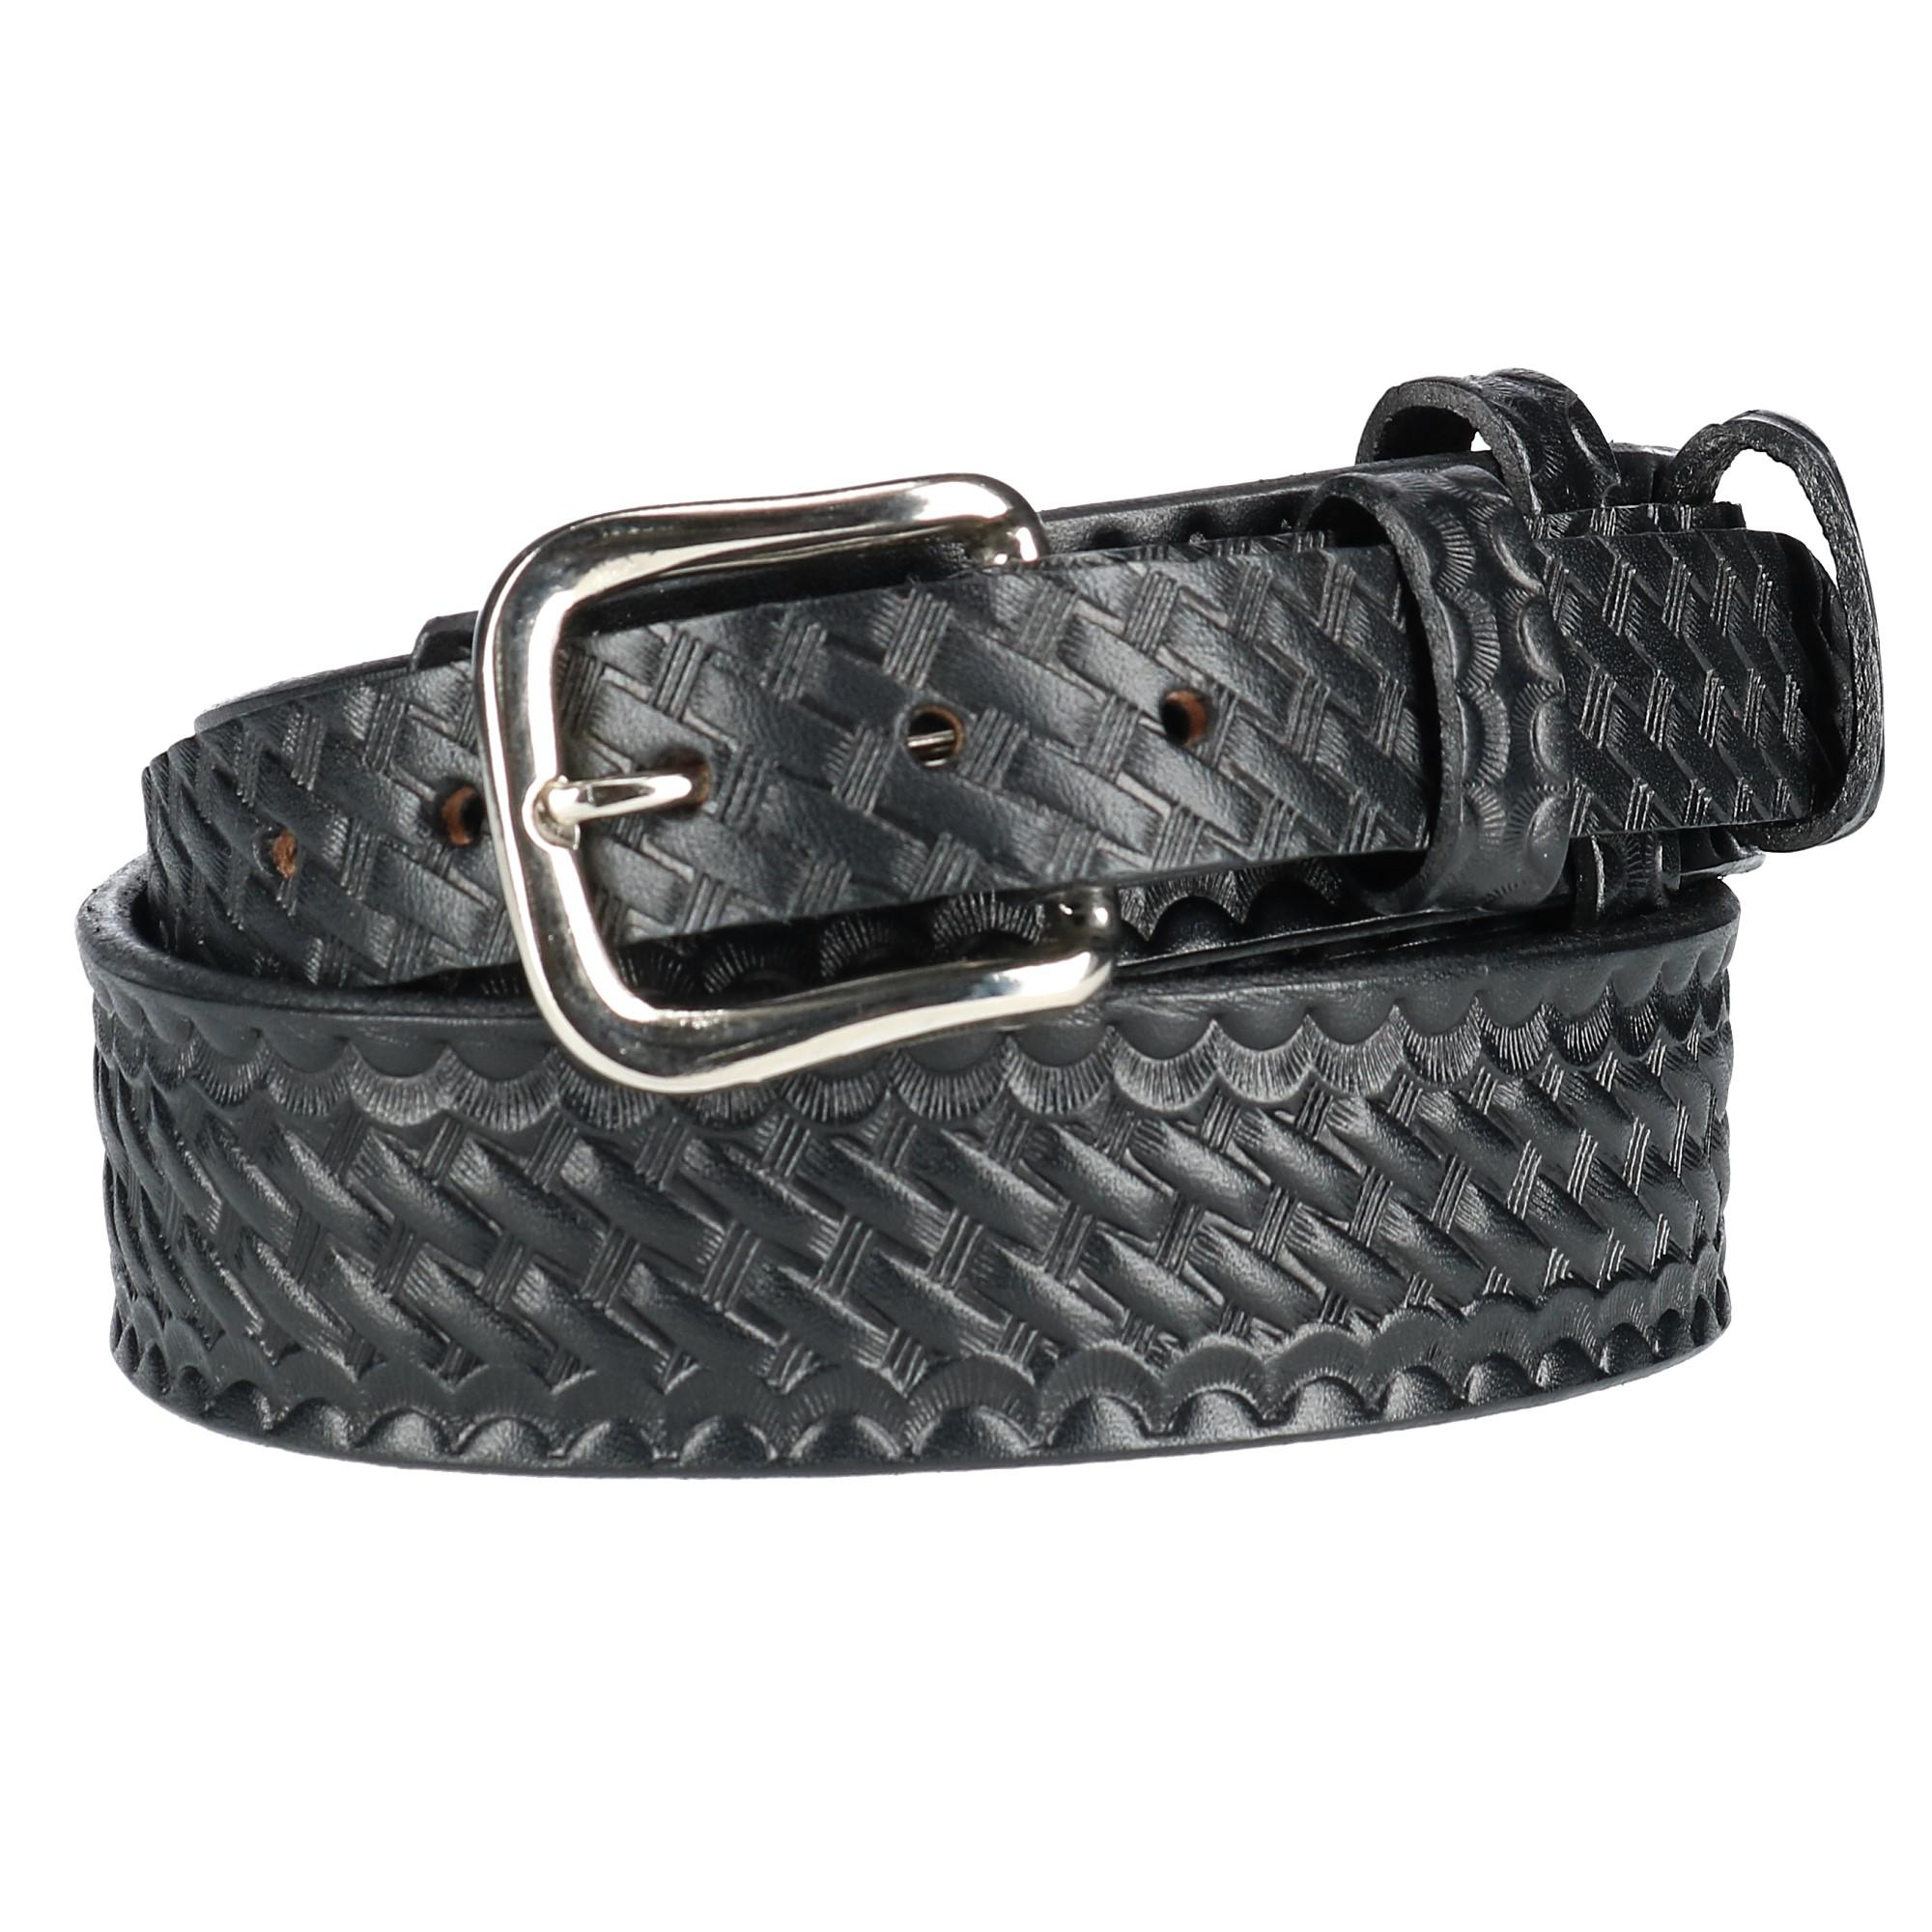 Boston Leather Men's Leather Basketweave Ranger Belt